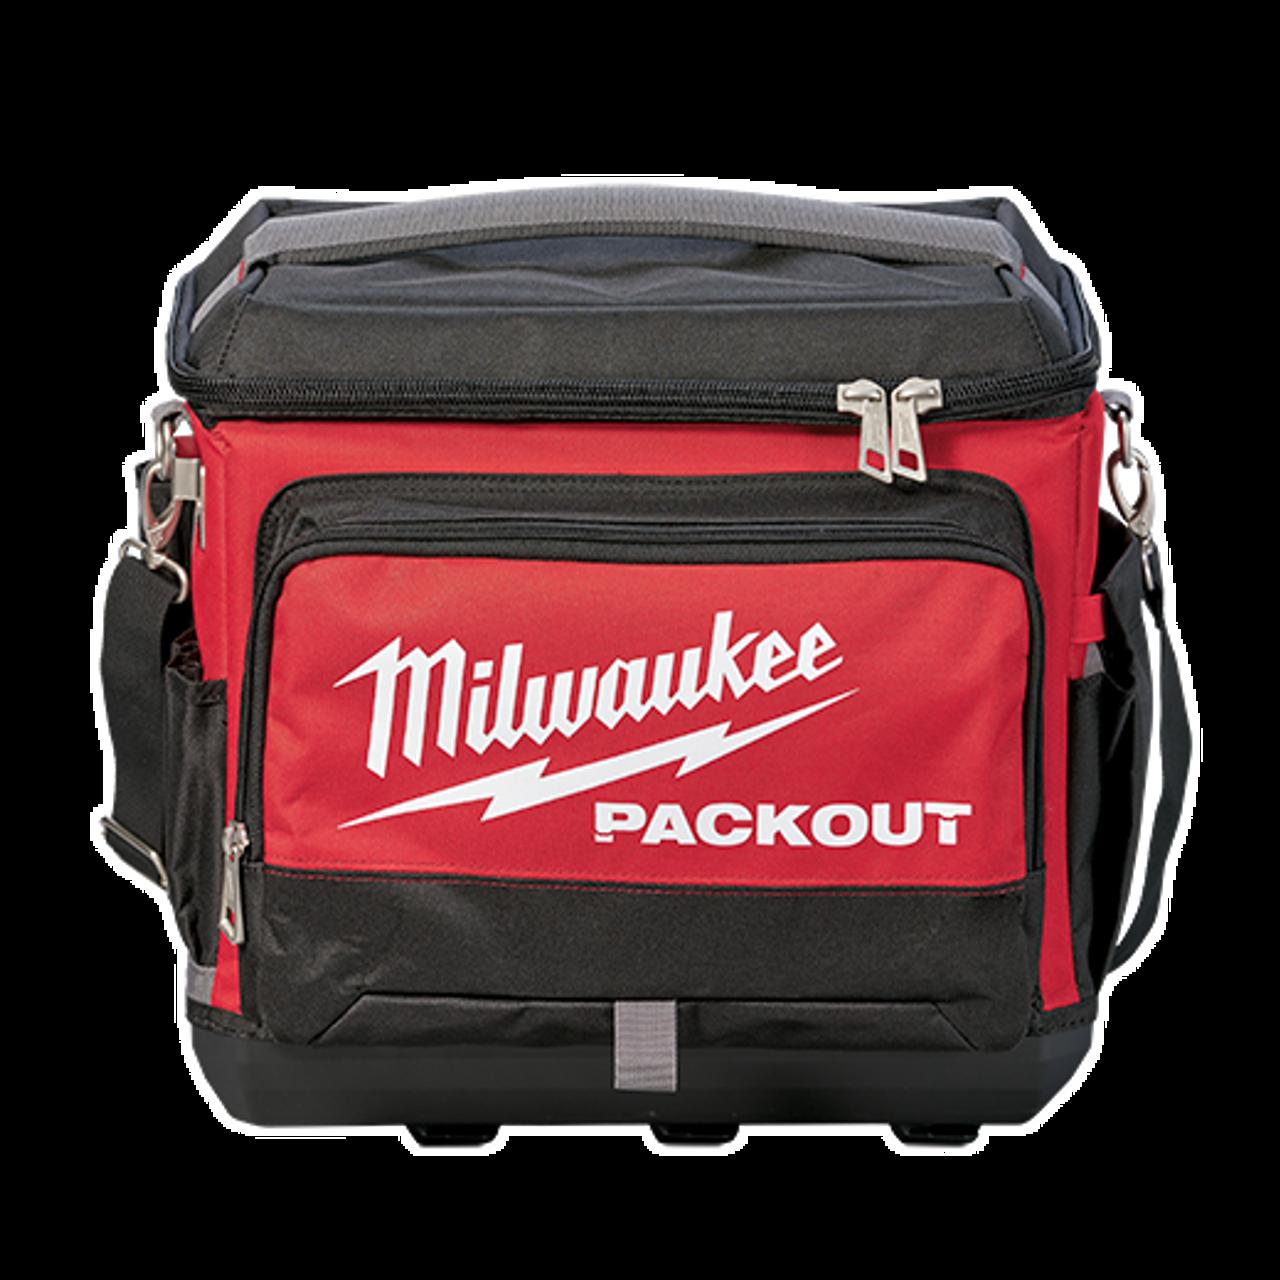 aeb4aeb50d70 Milwaukee 48-22-8302 PACKOUT Cooler - Atlas-Machinery Ltd.